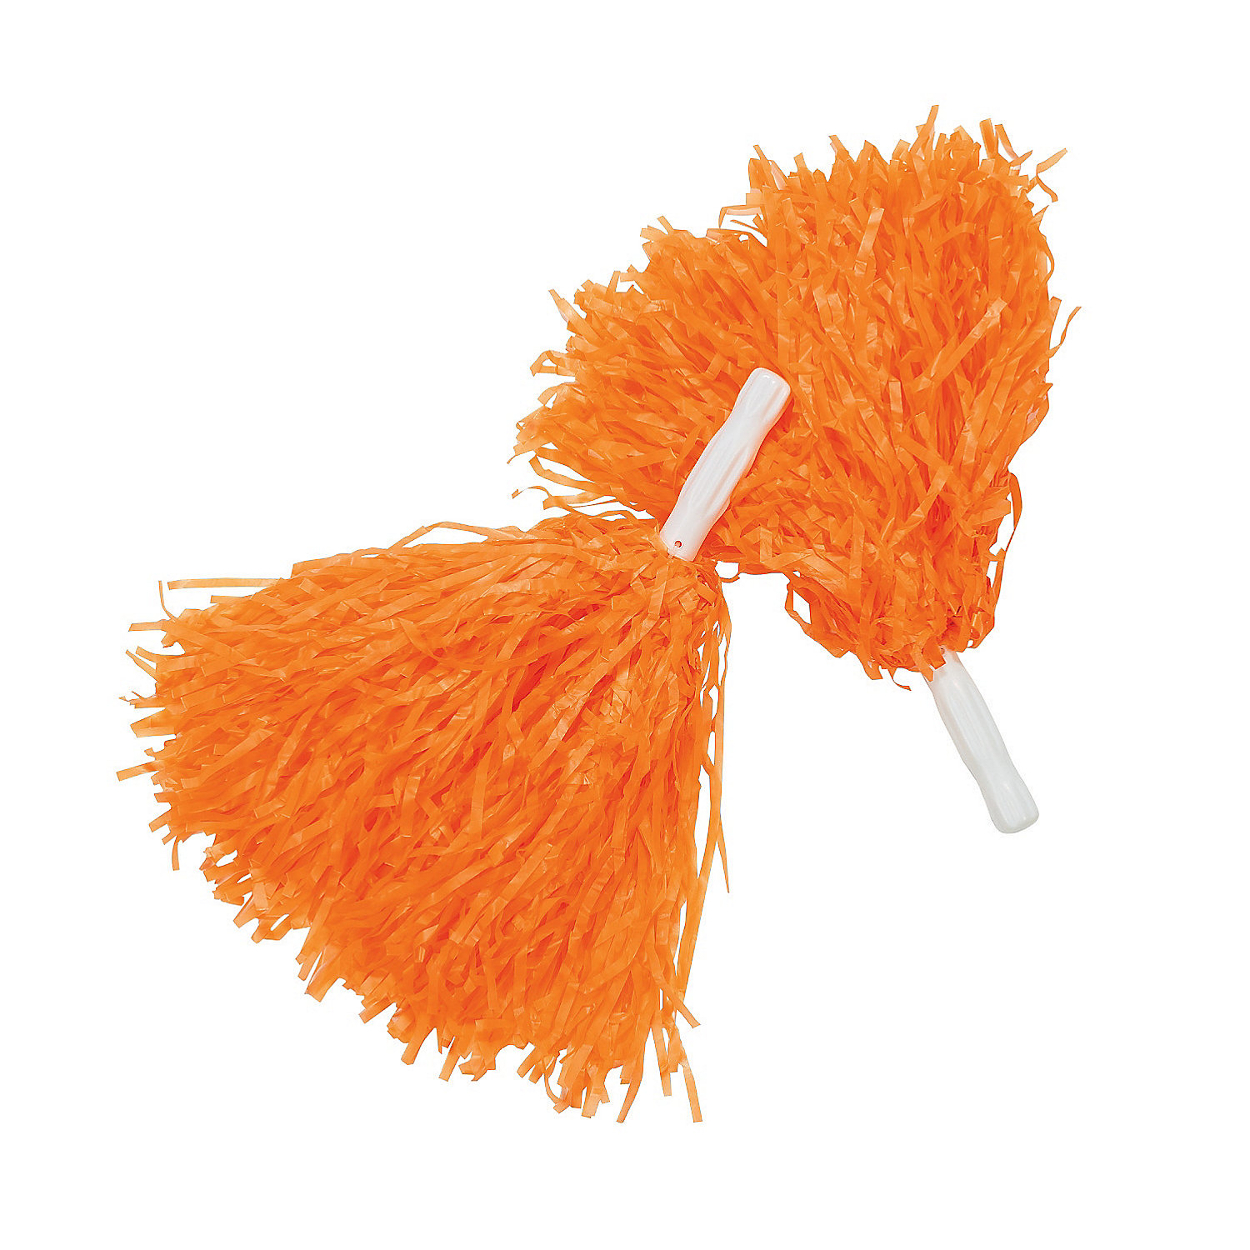 Orange Pom-Poms (Pair) Cheerleader Cheer Leader Squad Pep Costume Accessory - image 1 of 1